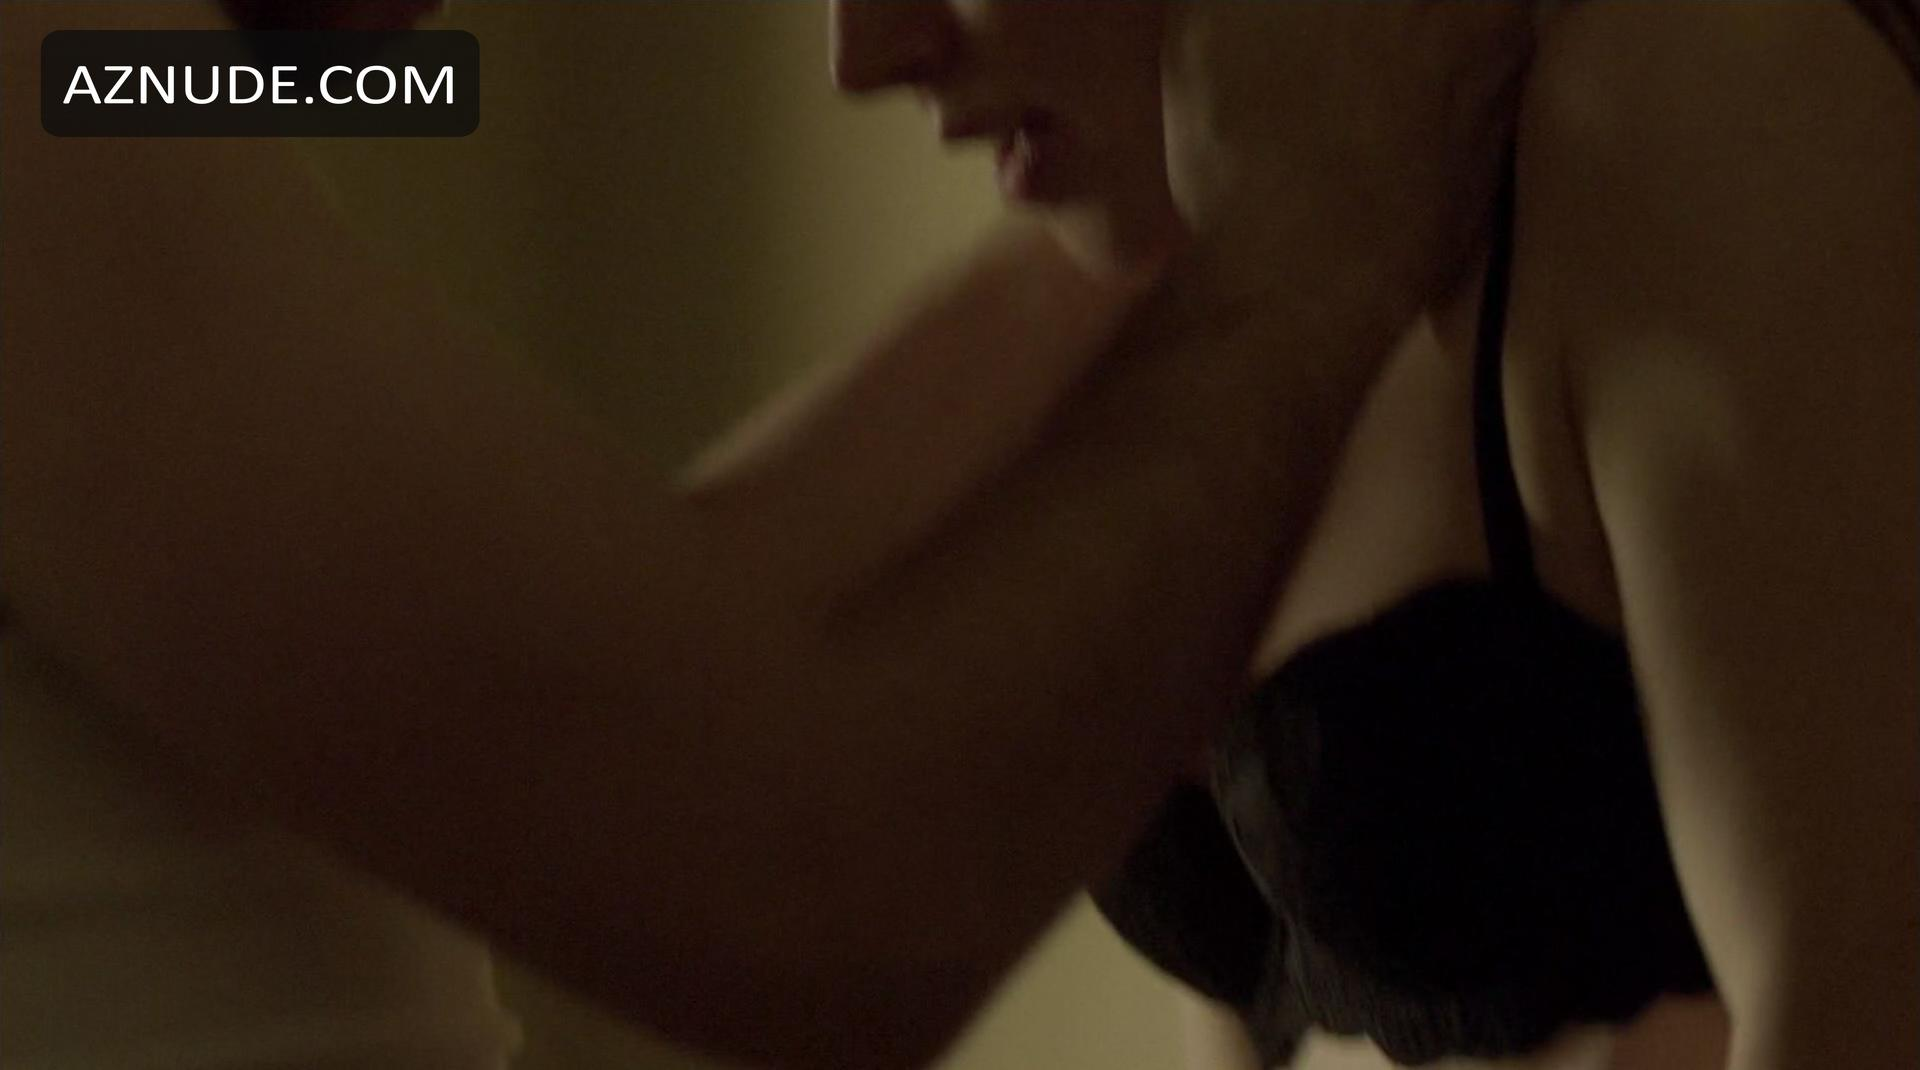 Amanda Schull Nude Pics amanda schull nude - aznude